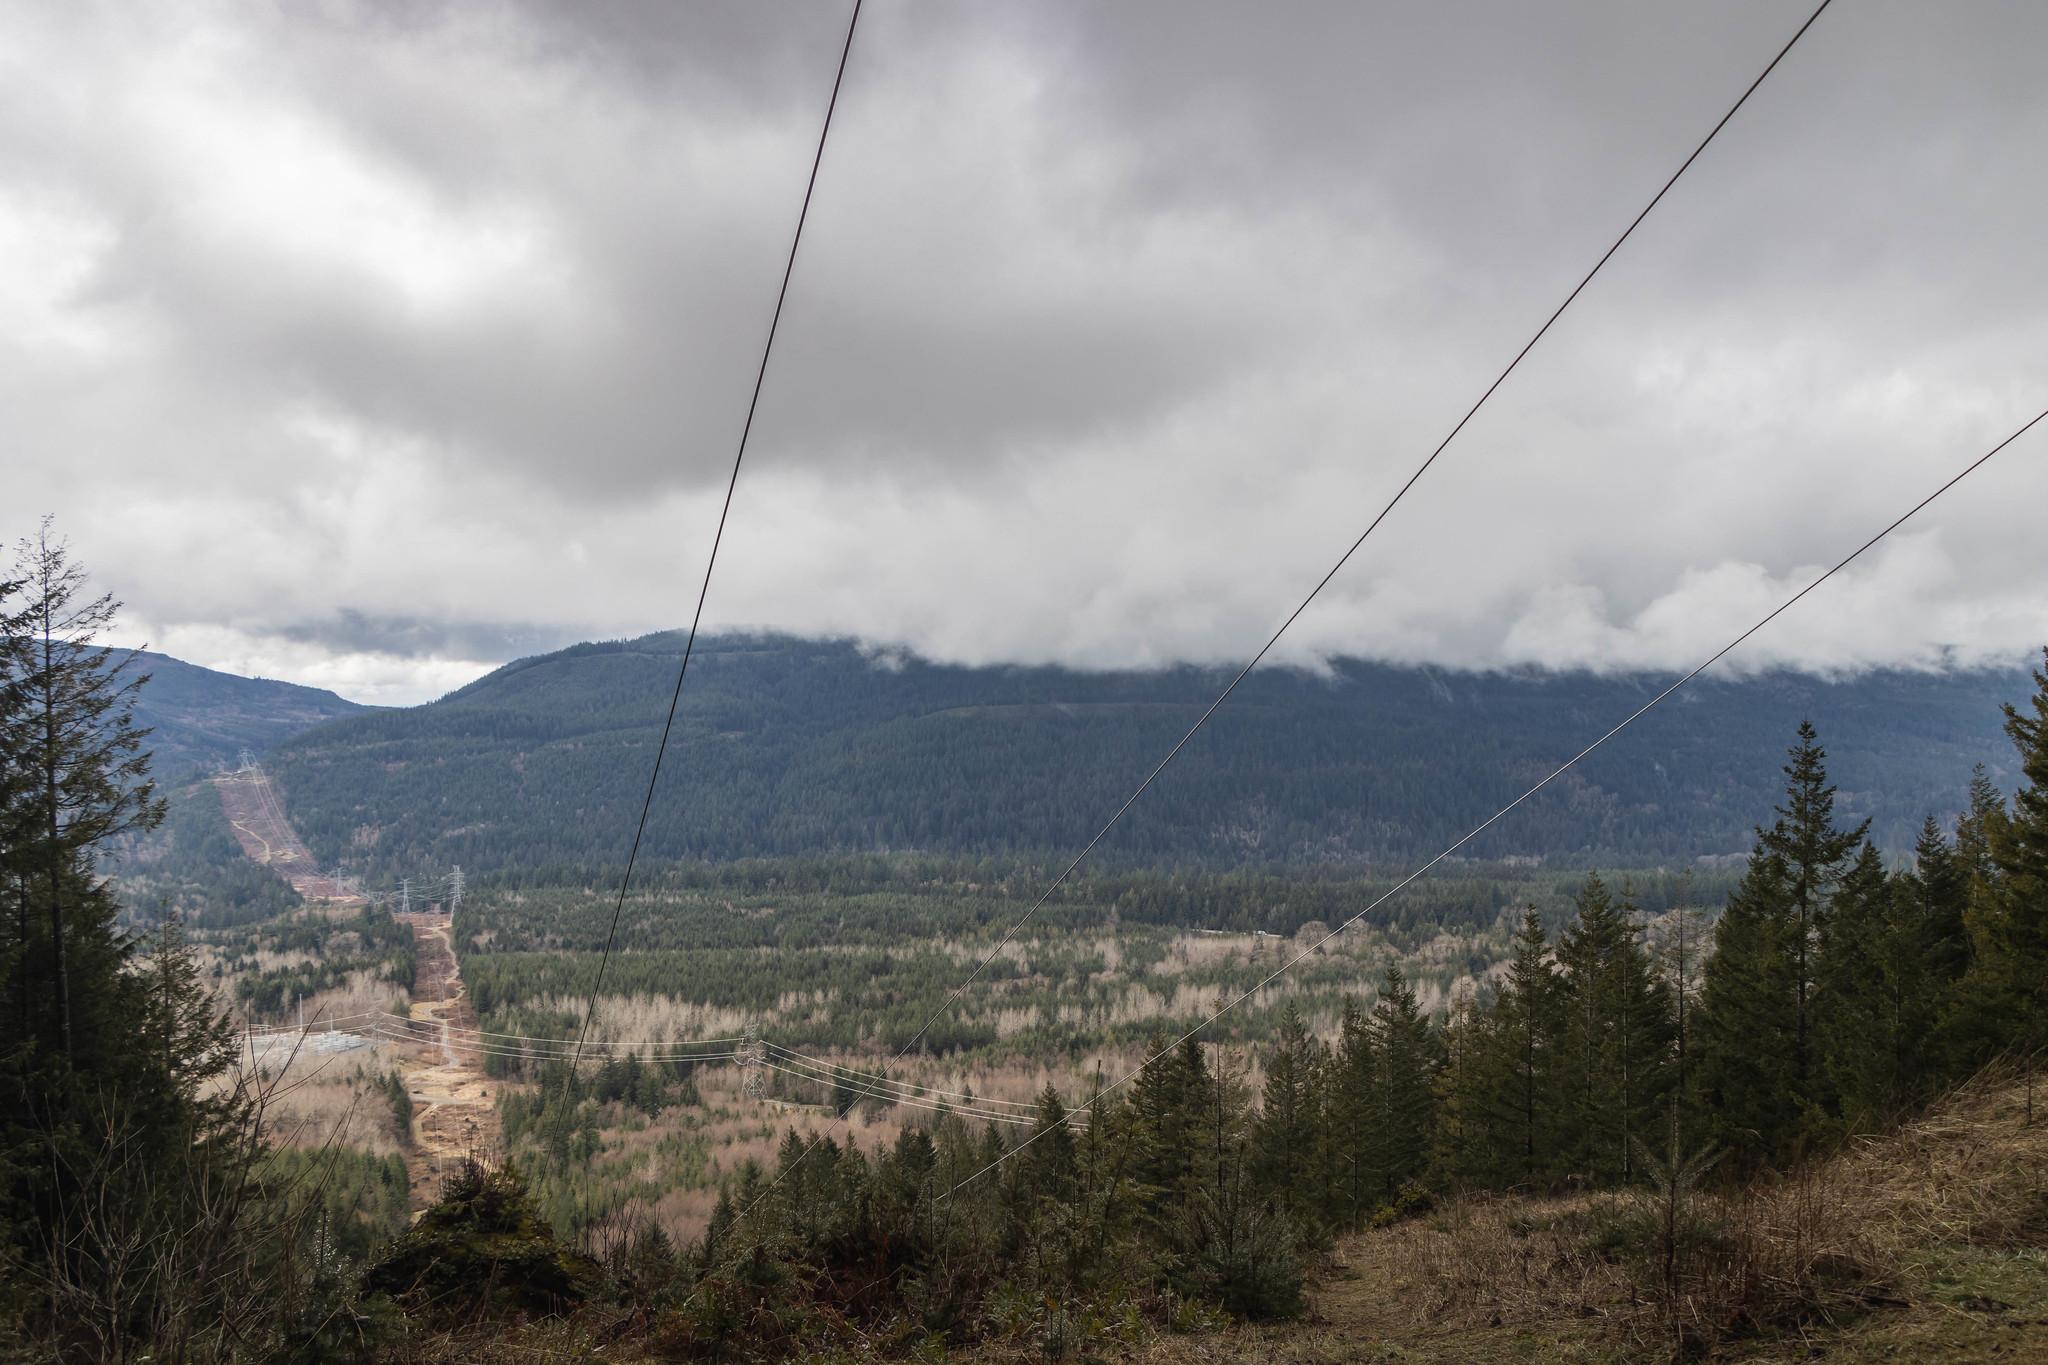 En route to Rattlesnake Mountain Northwest Peak